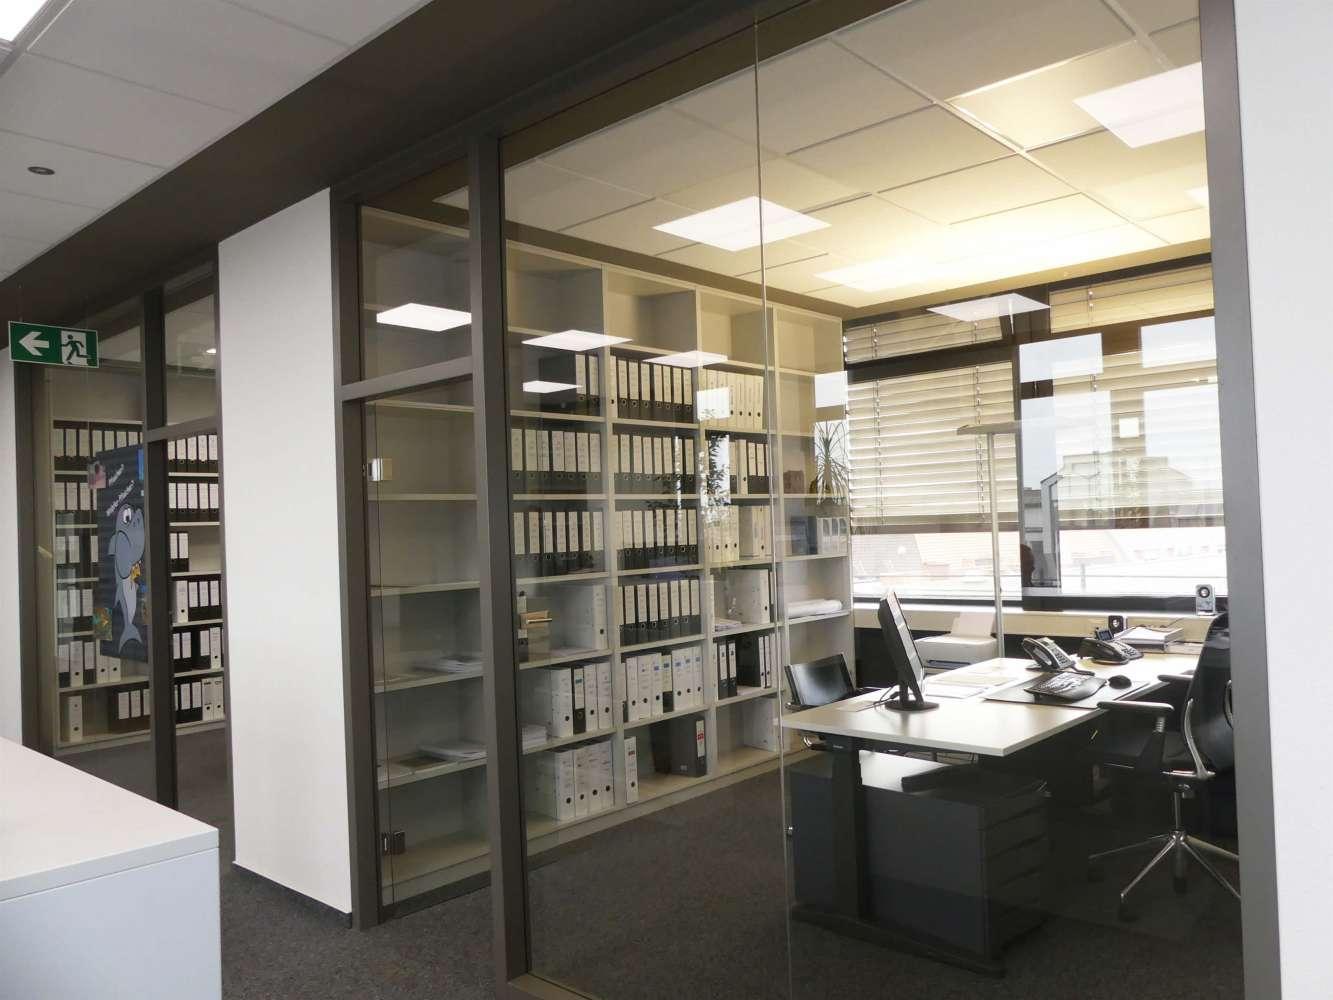 Büros Bielefeld, 33602 - Büro - Bielefeld, Innenstadt - H1486 - 10566482